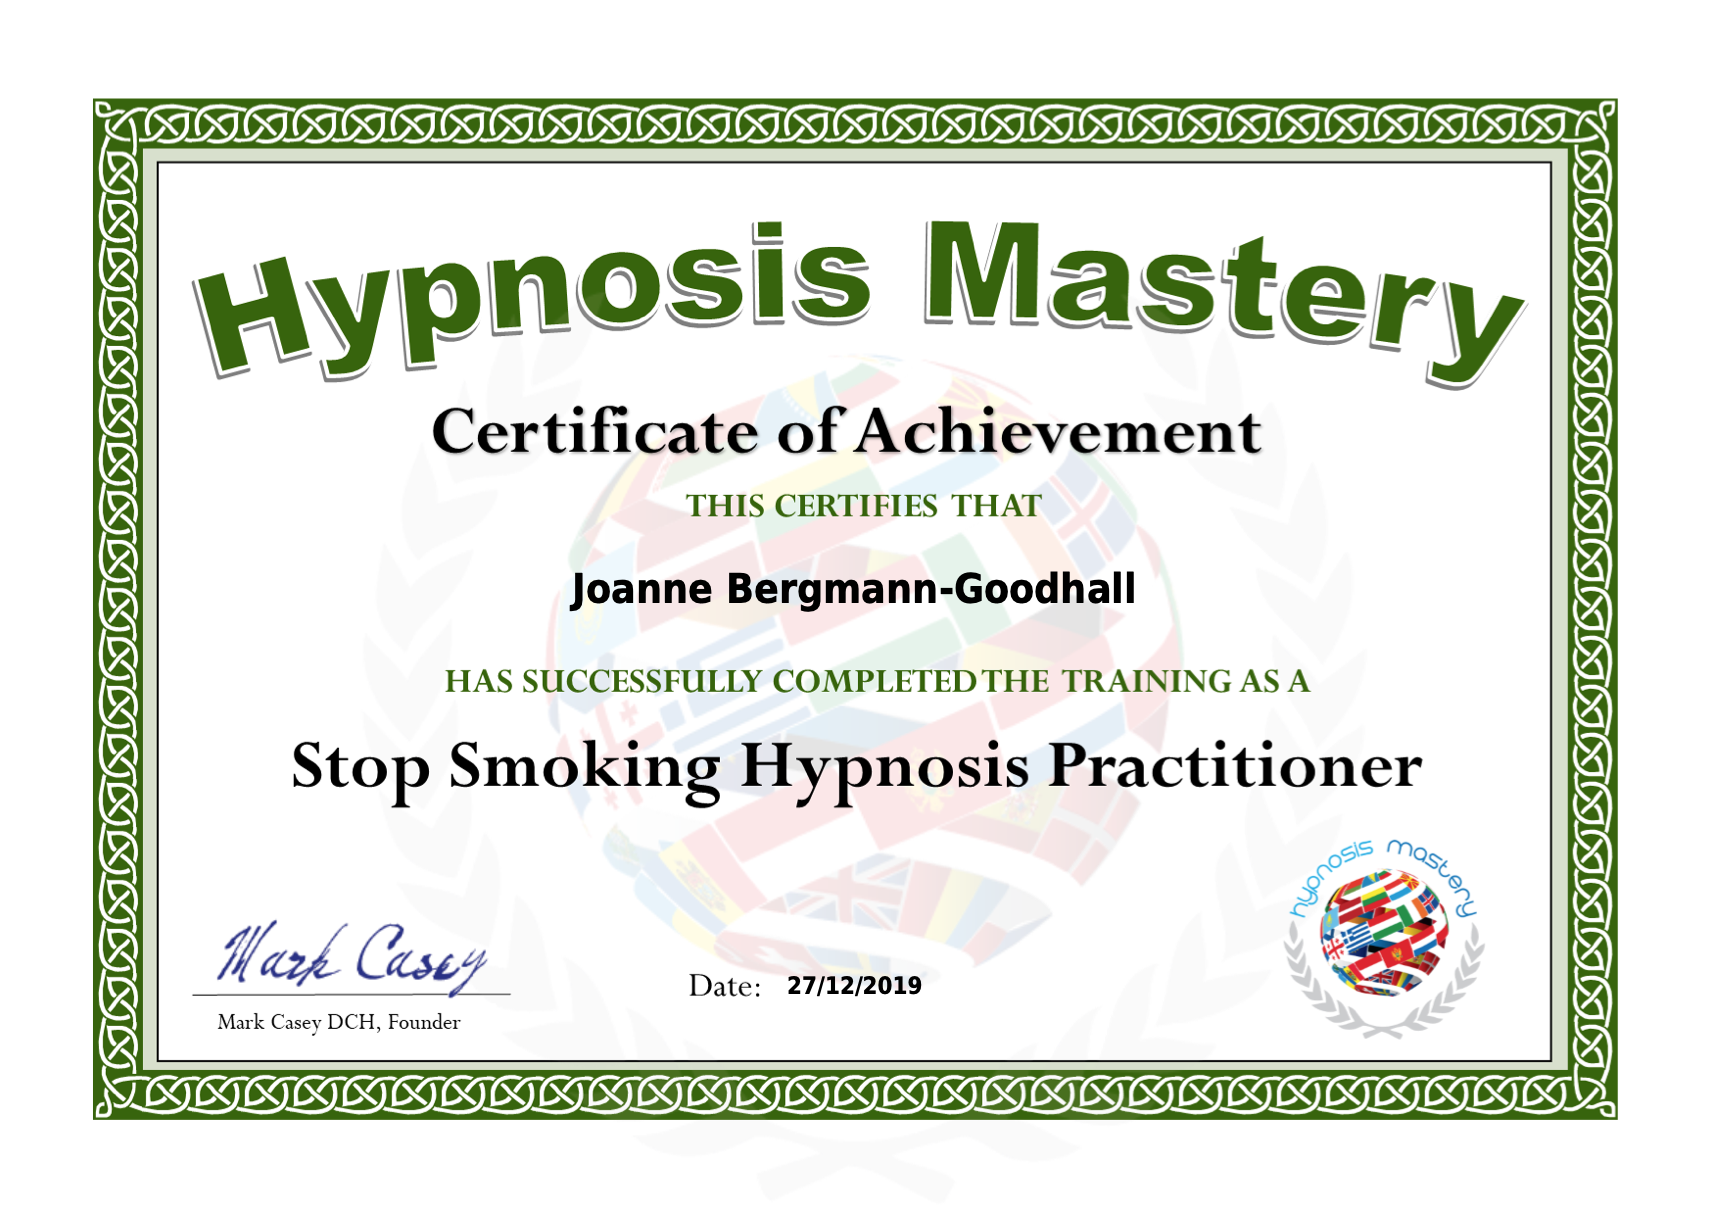 Hypnosis Mastery